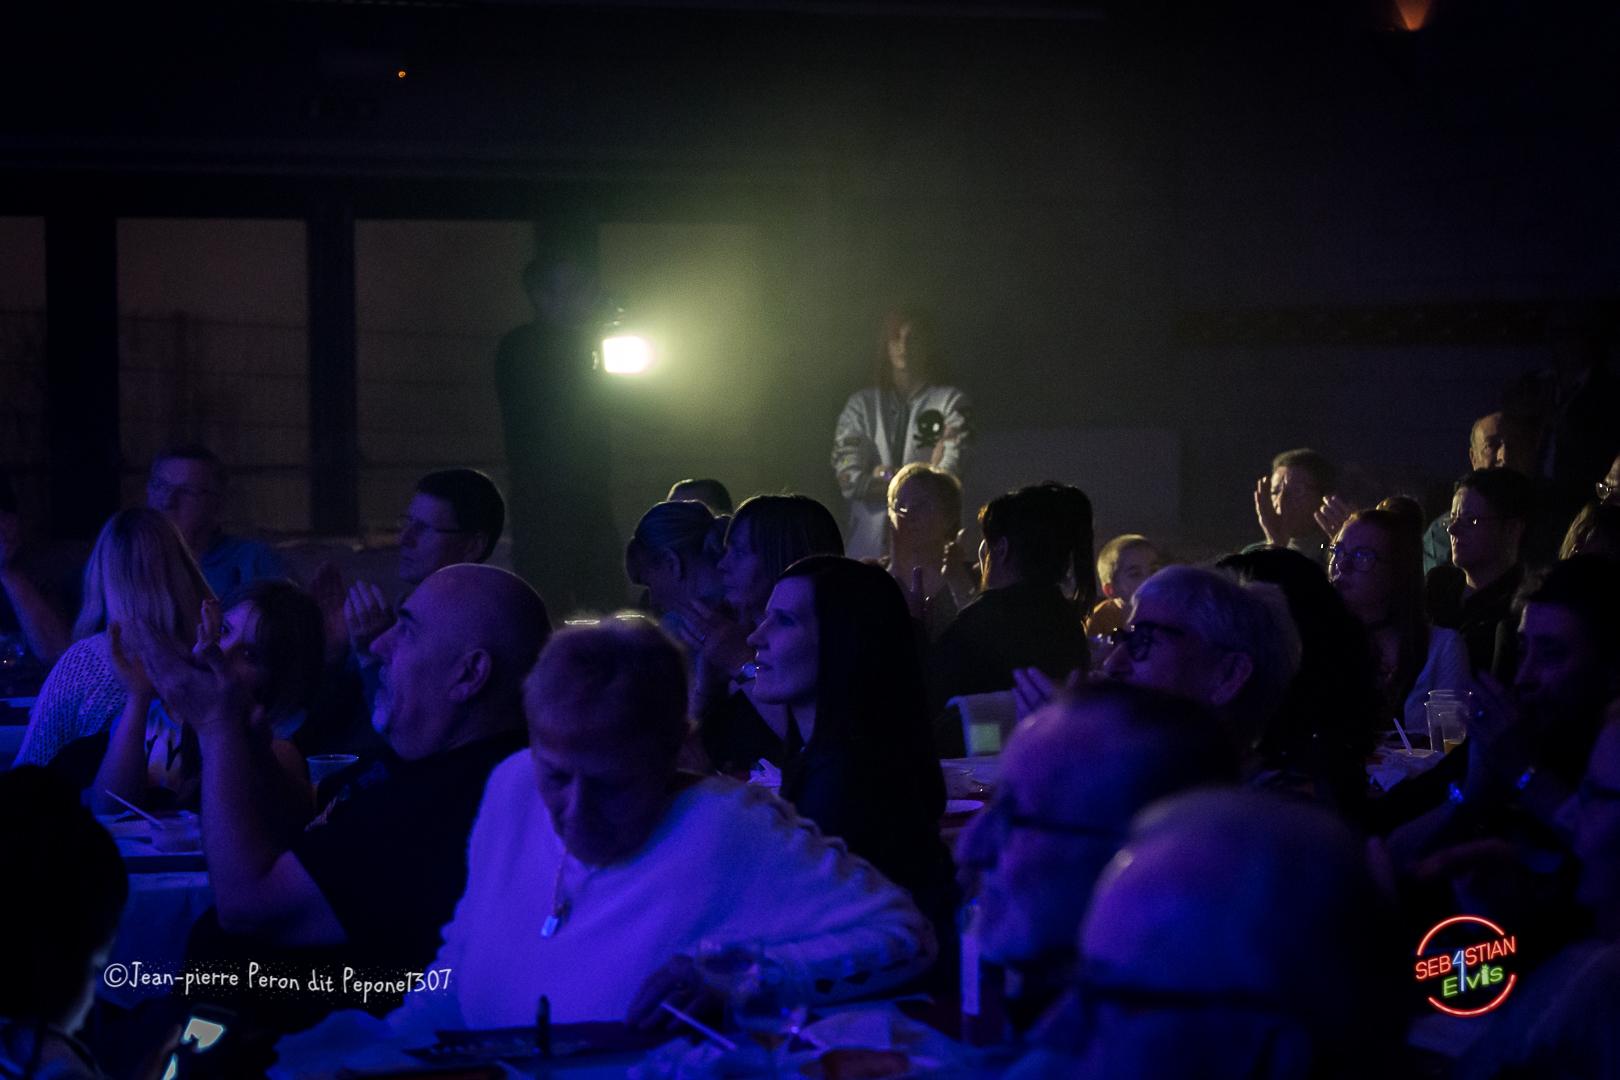 sebastian-for-elvis-pepone1307-centre-culturel-rocourt-facebook-23